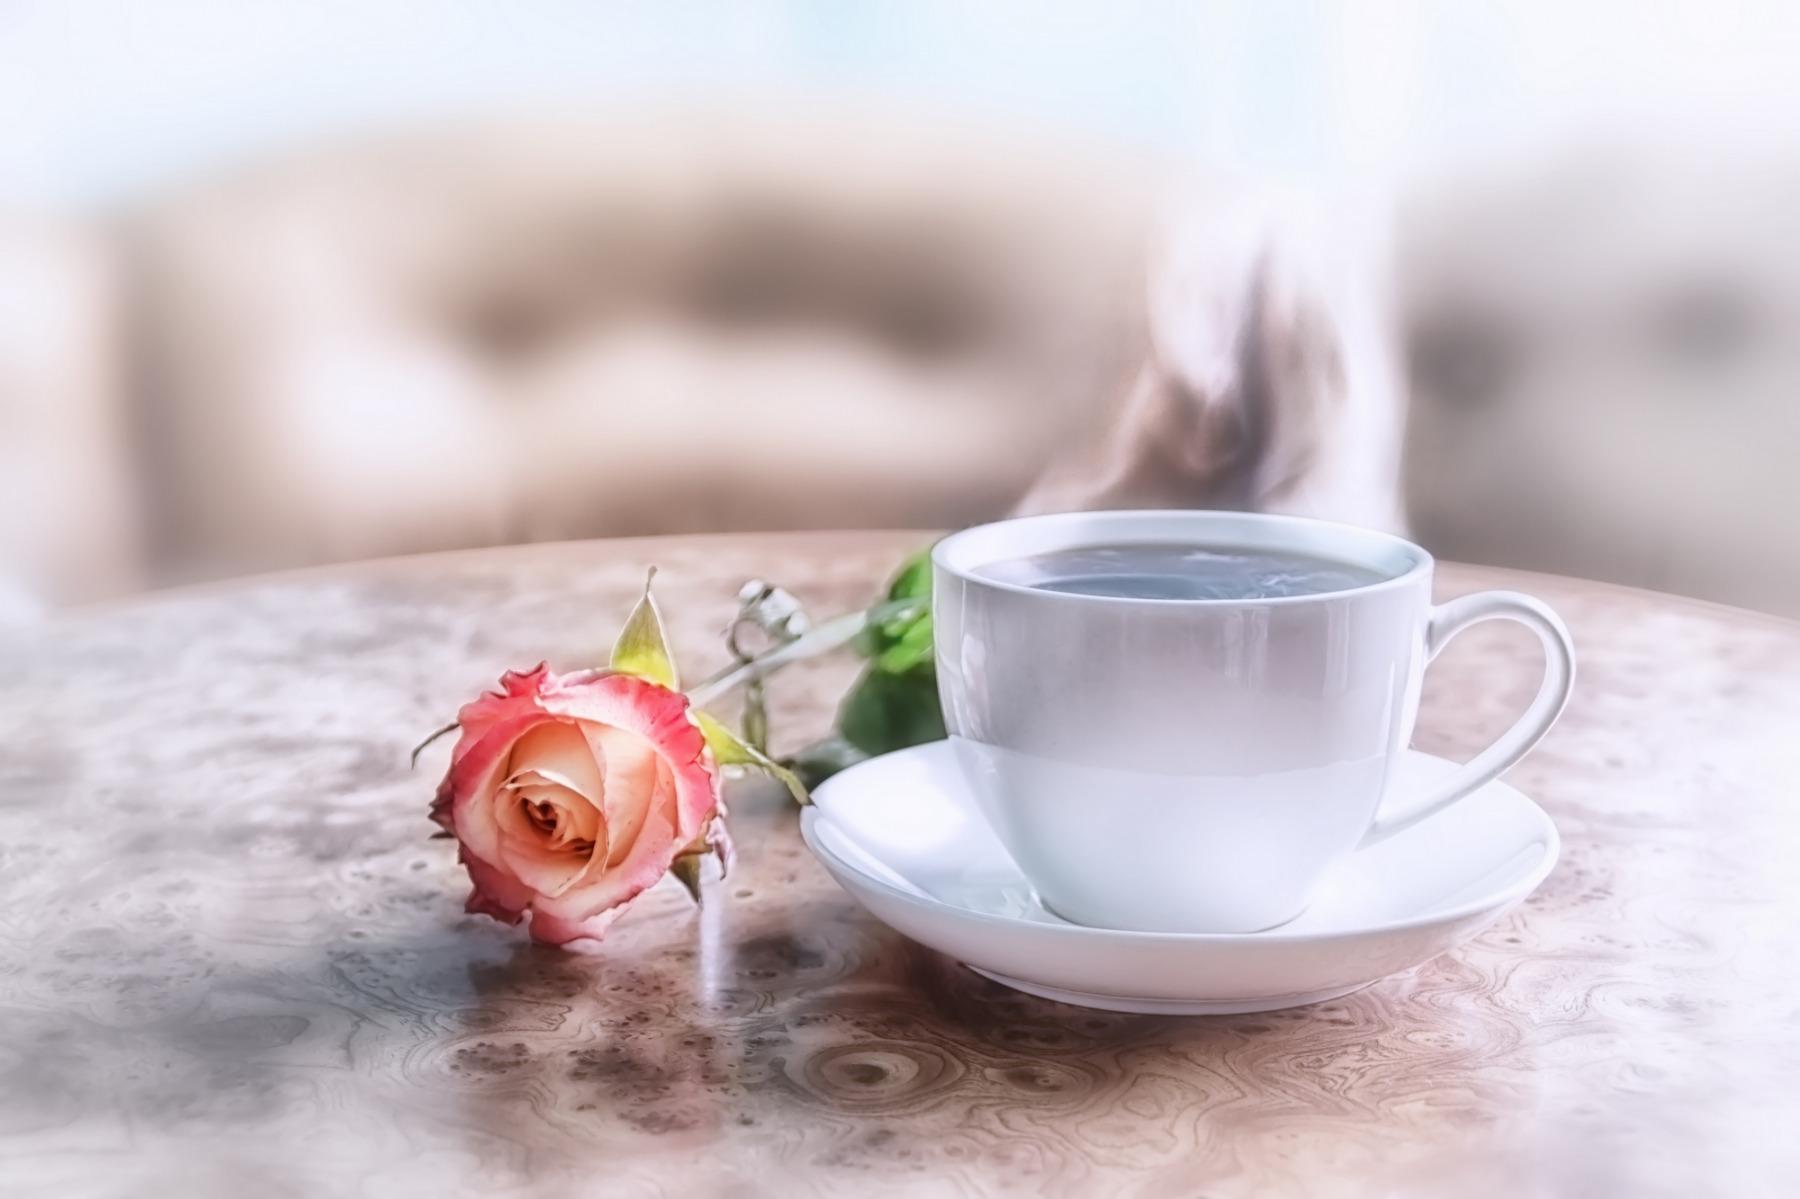 День картинки, романтичную картинку доброе утро